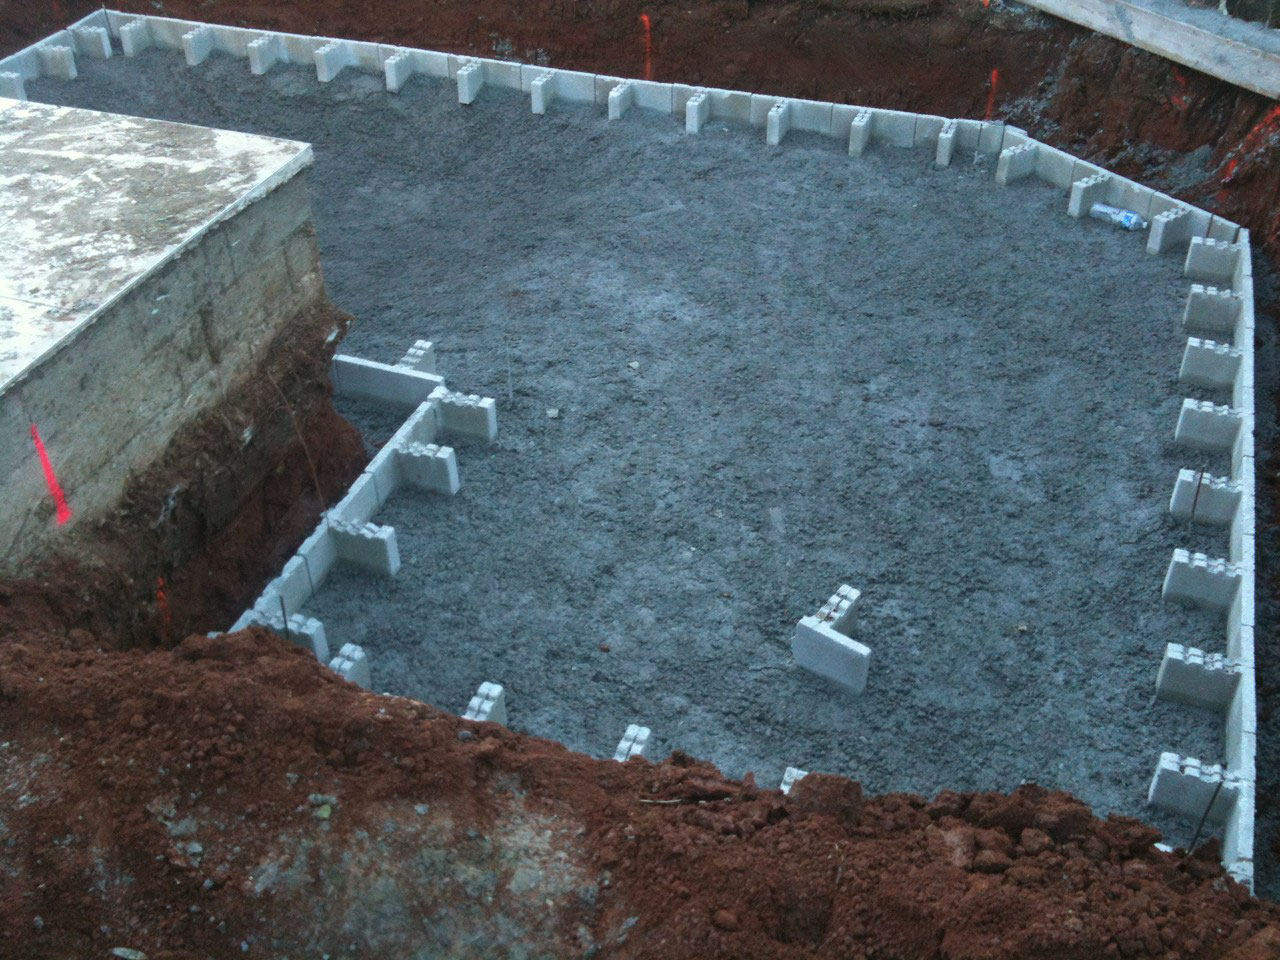 Constructeur de piscines et spas 0660978914 piscine kachou for Constructeur piscine 31